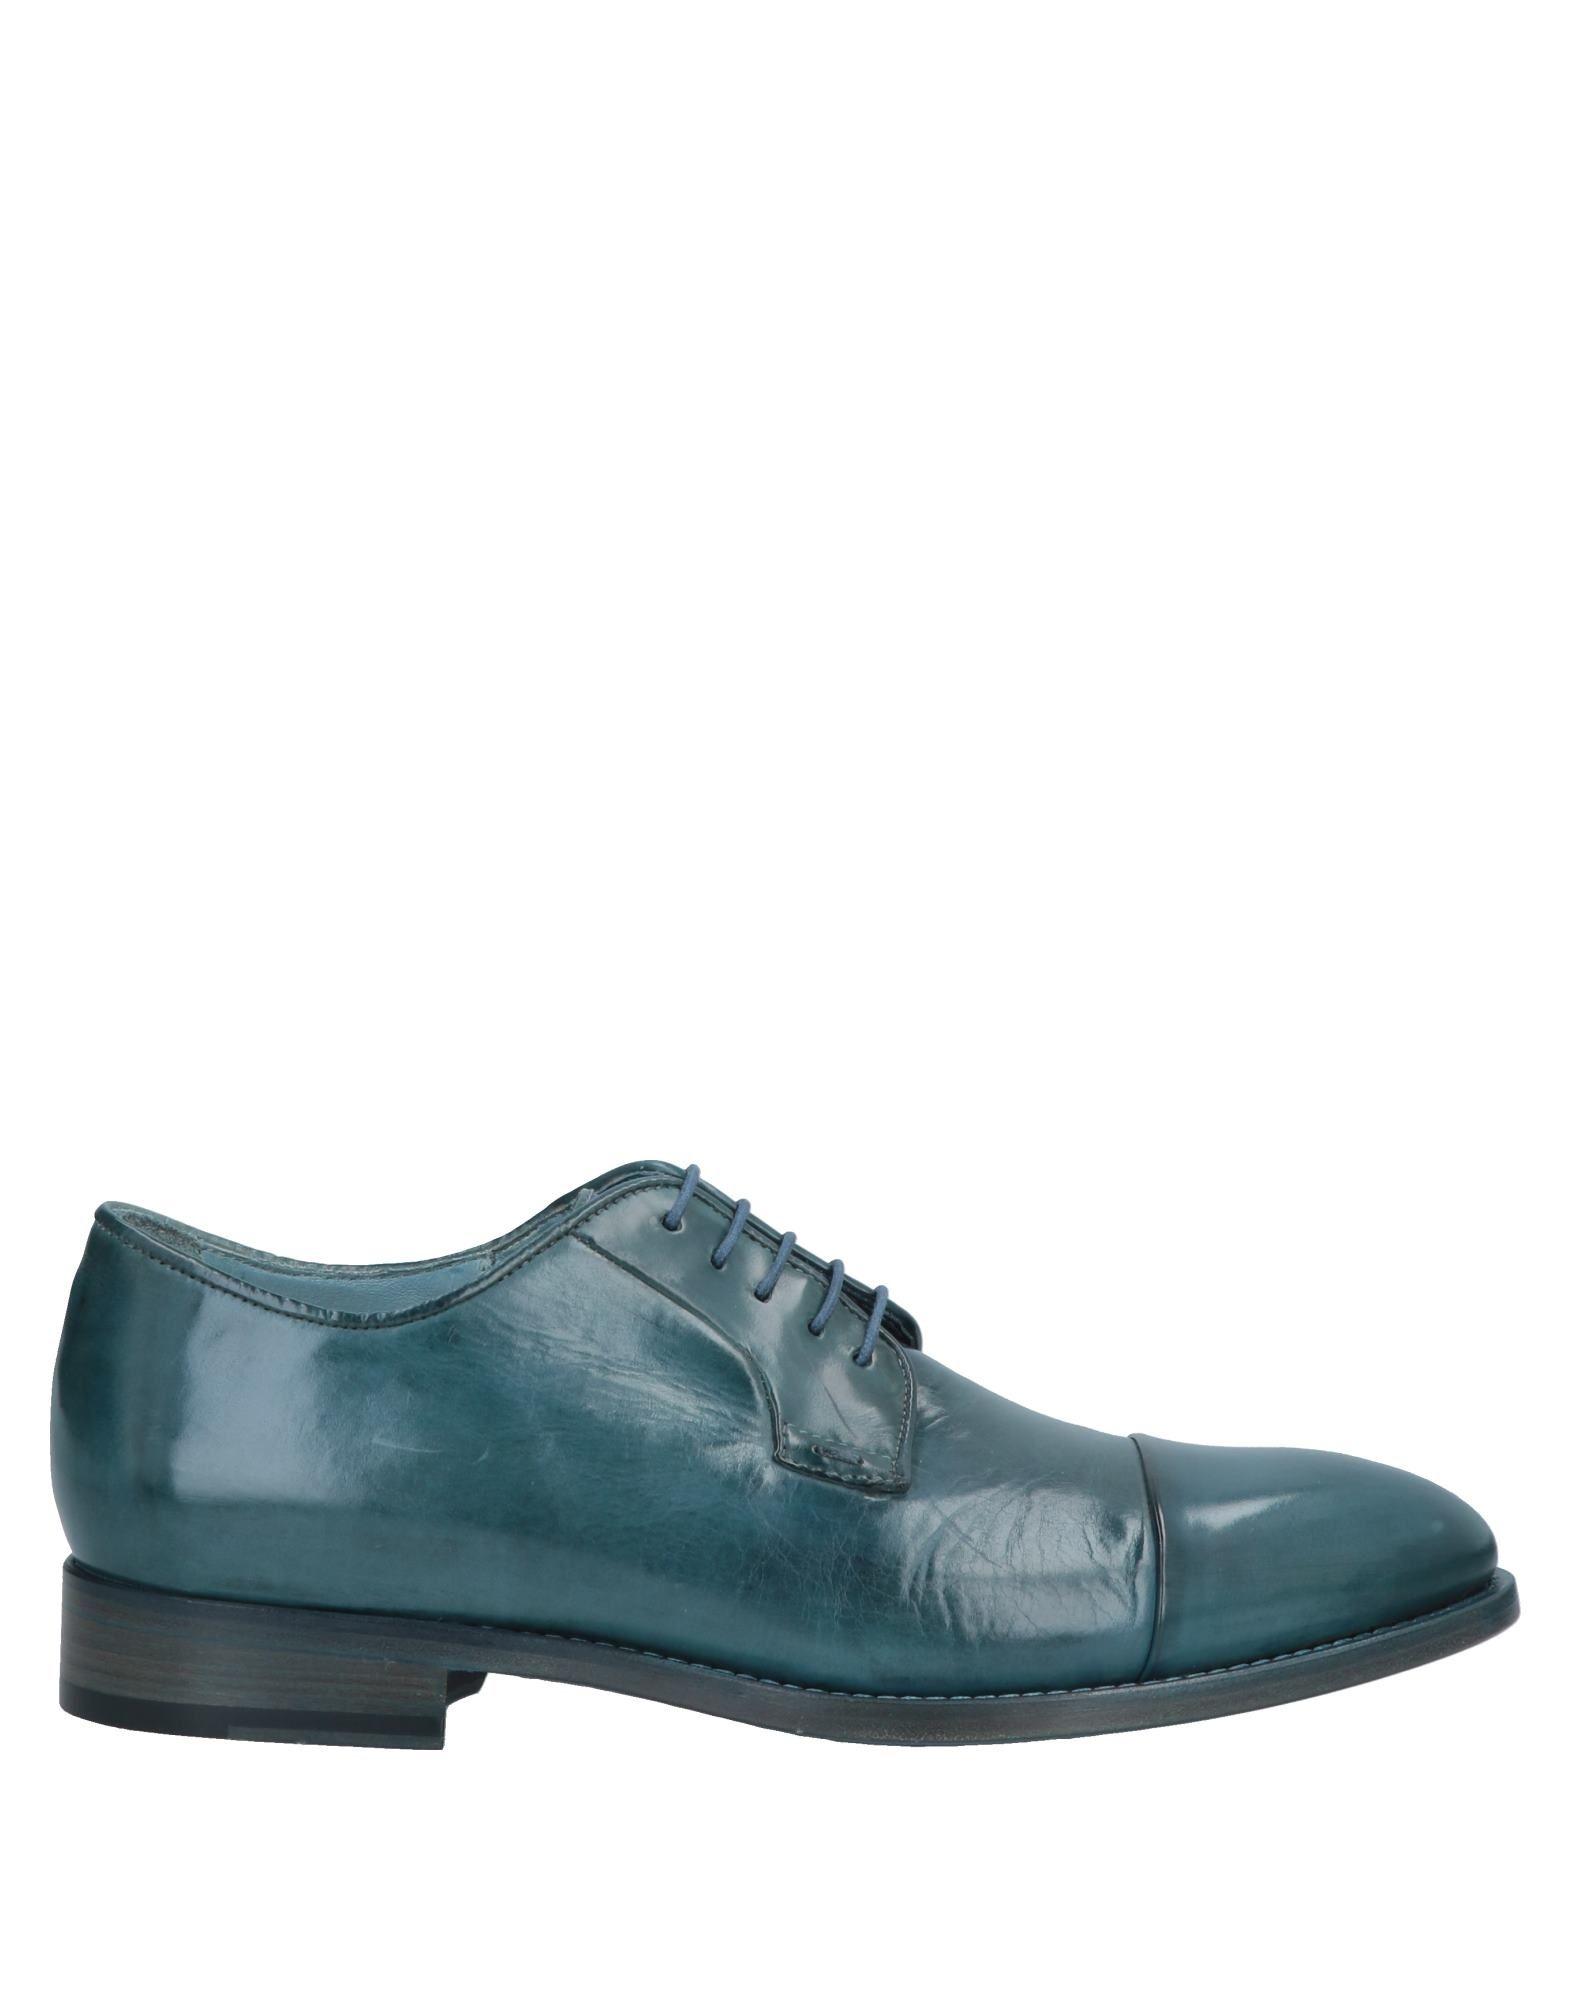 Chaussures À Lacets Paul Smith Homme - Chaussures À Lacets Paul Smith   - 11684674DF